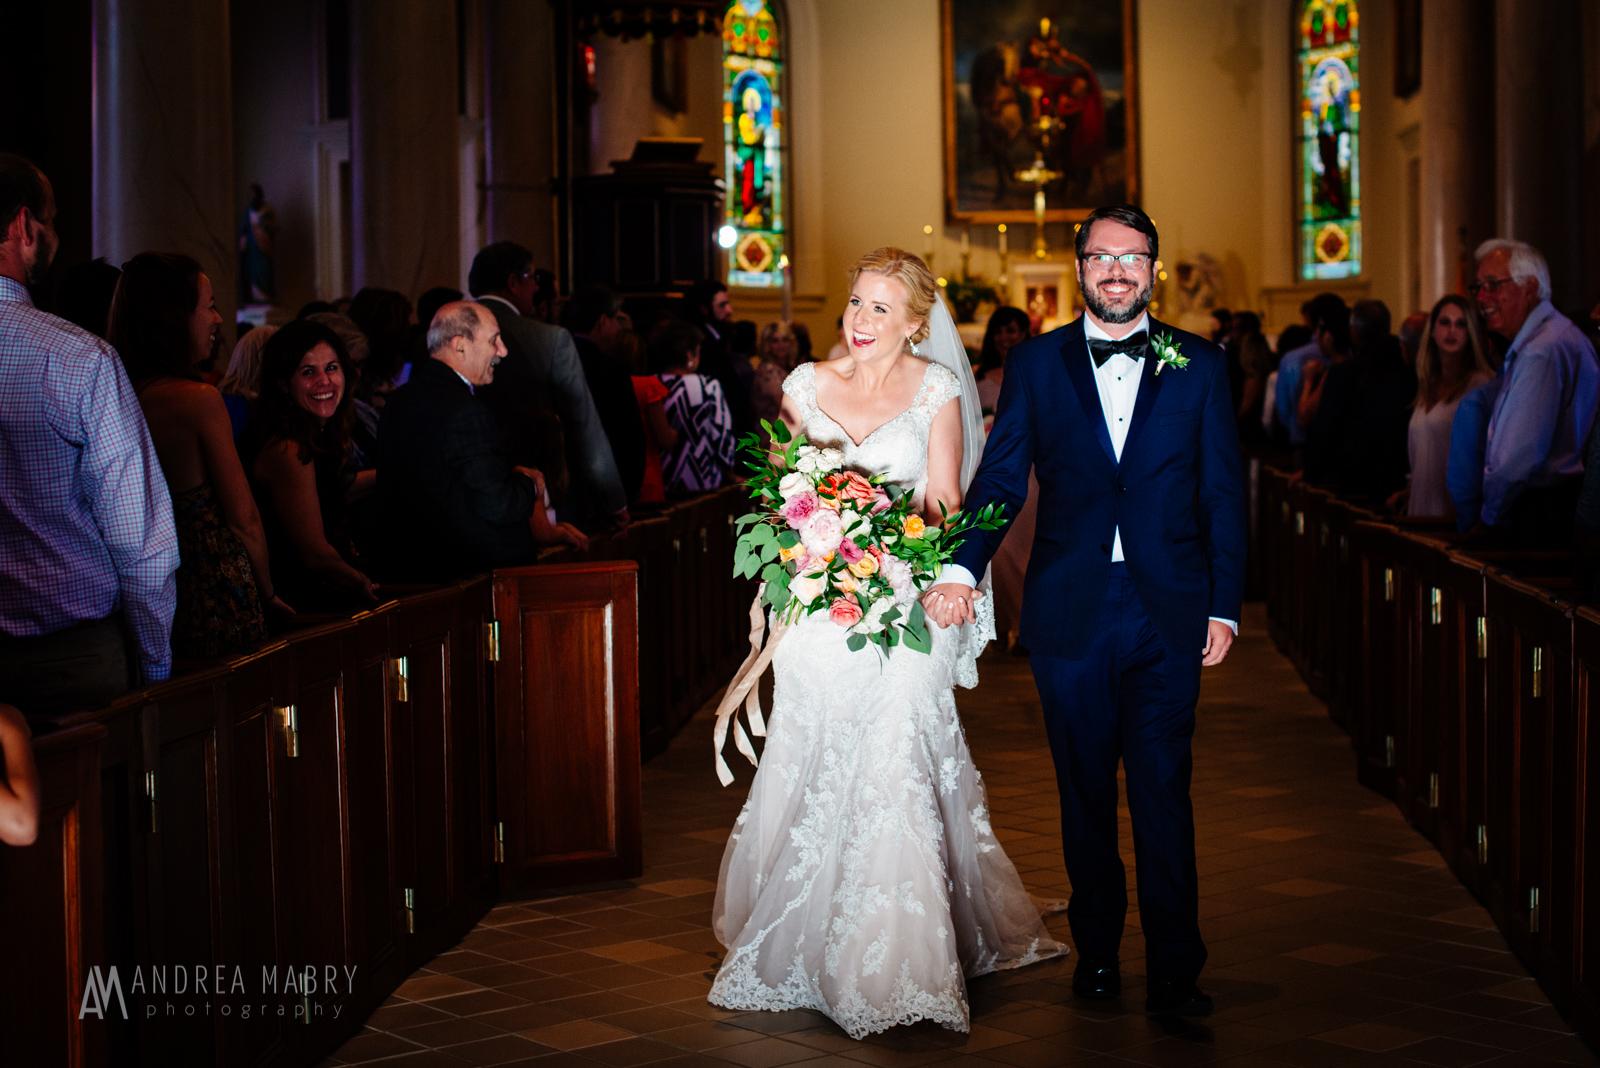 20170520-dooley-wed-mabry-blog-047-3712.jpg